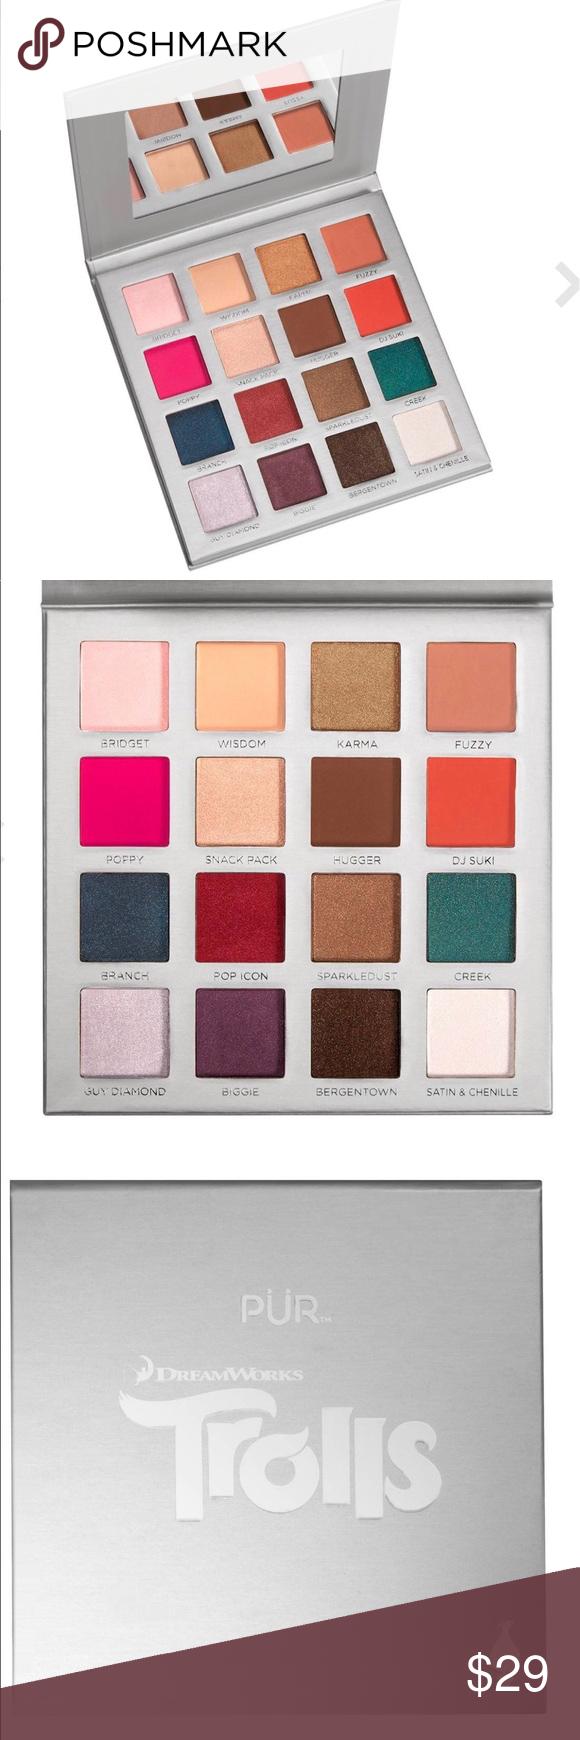 Pur Cosmetics Dreamworks Trolls Palette Pur cosmetics